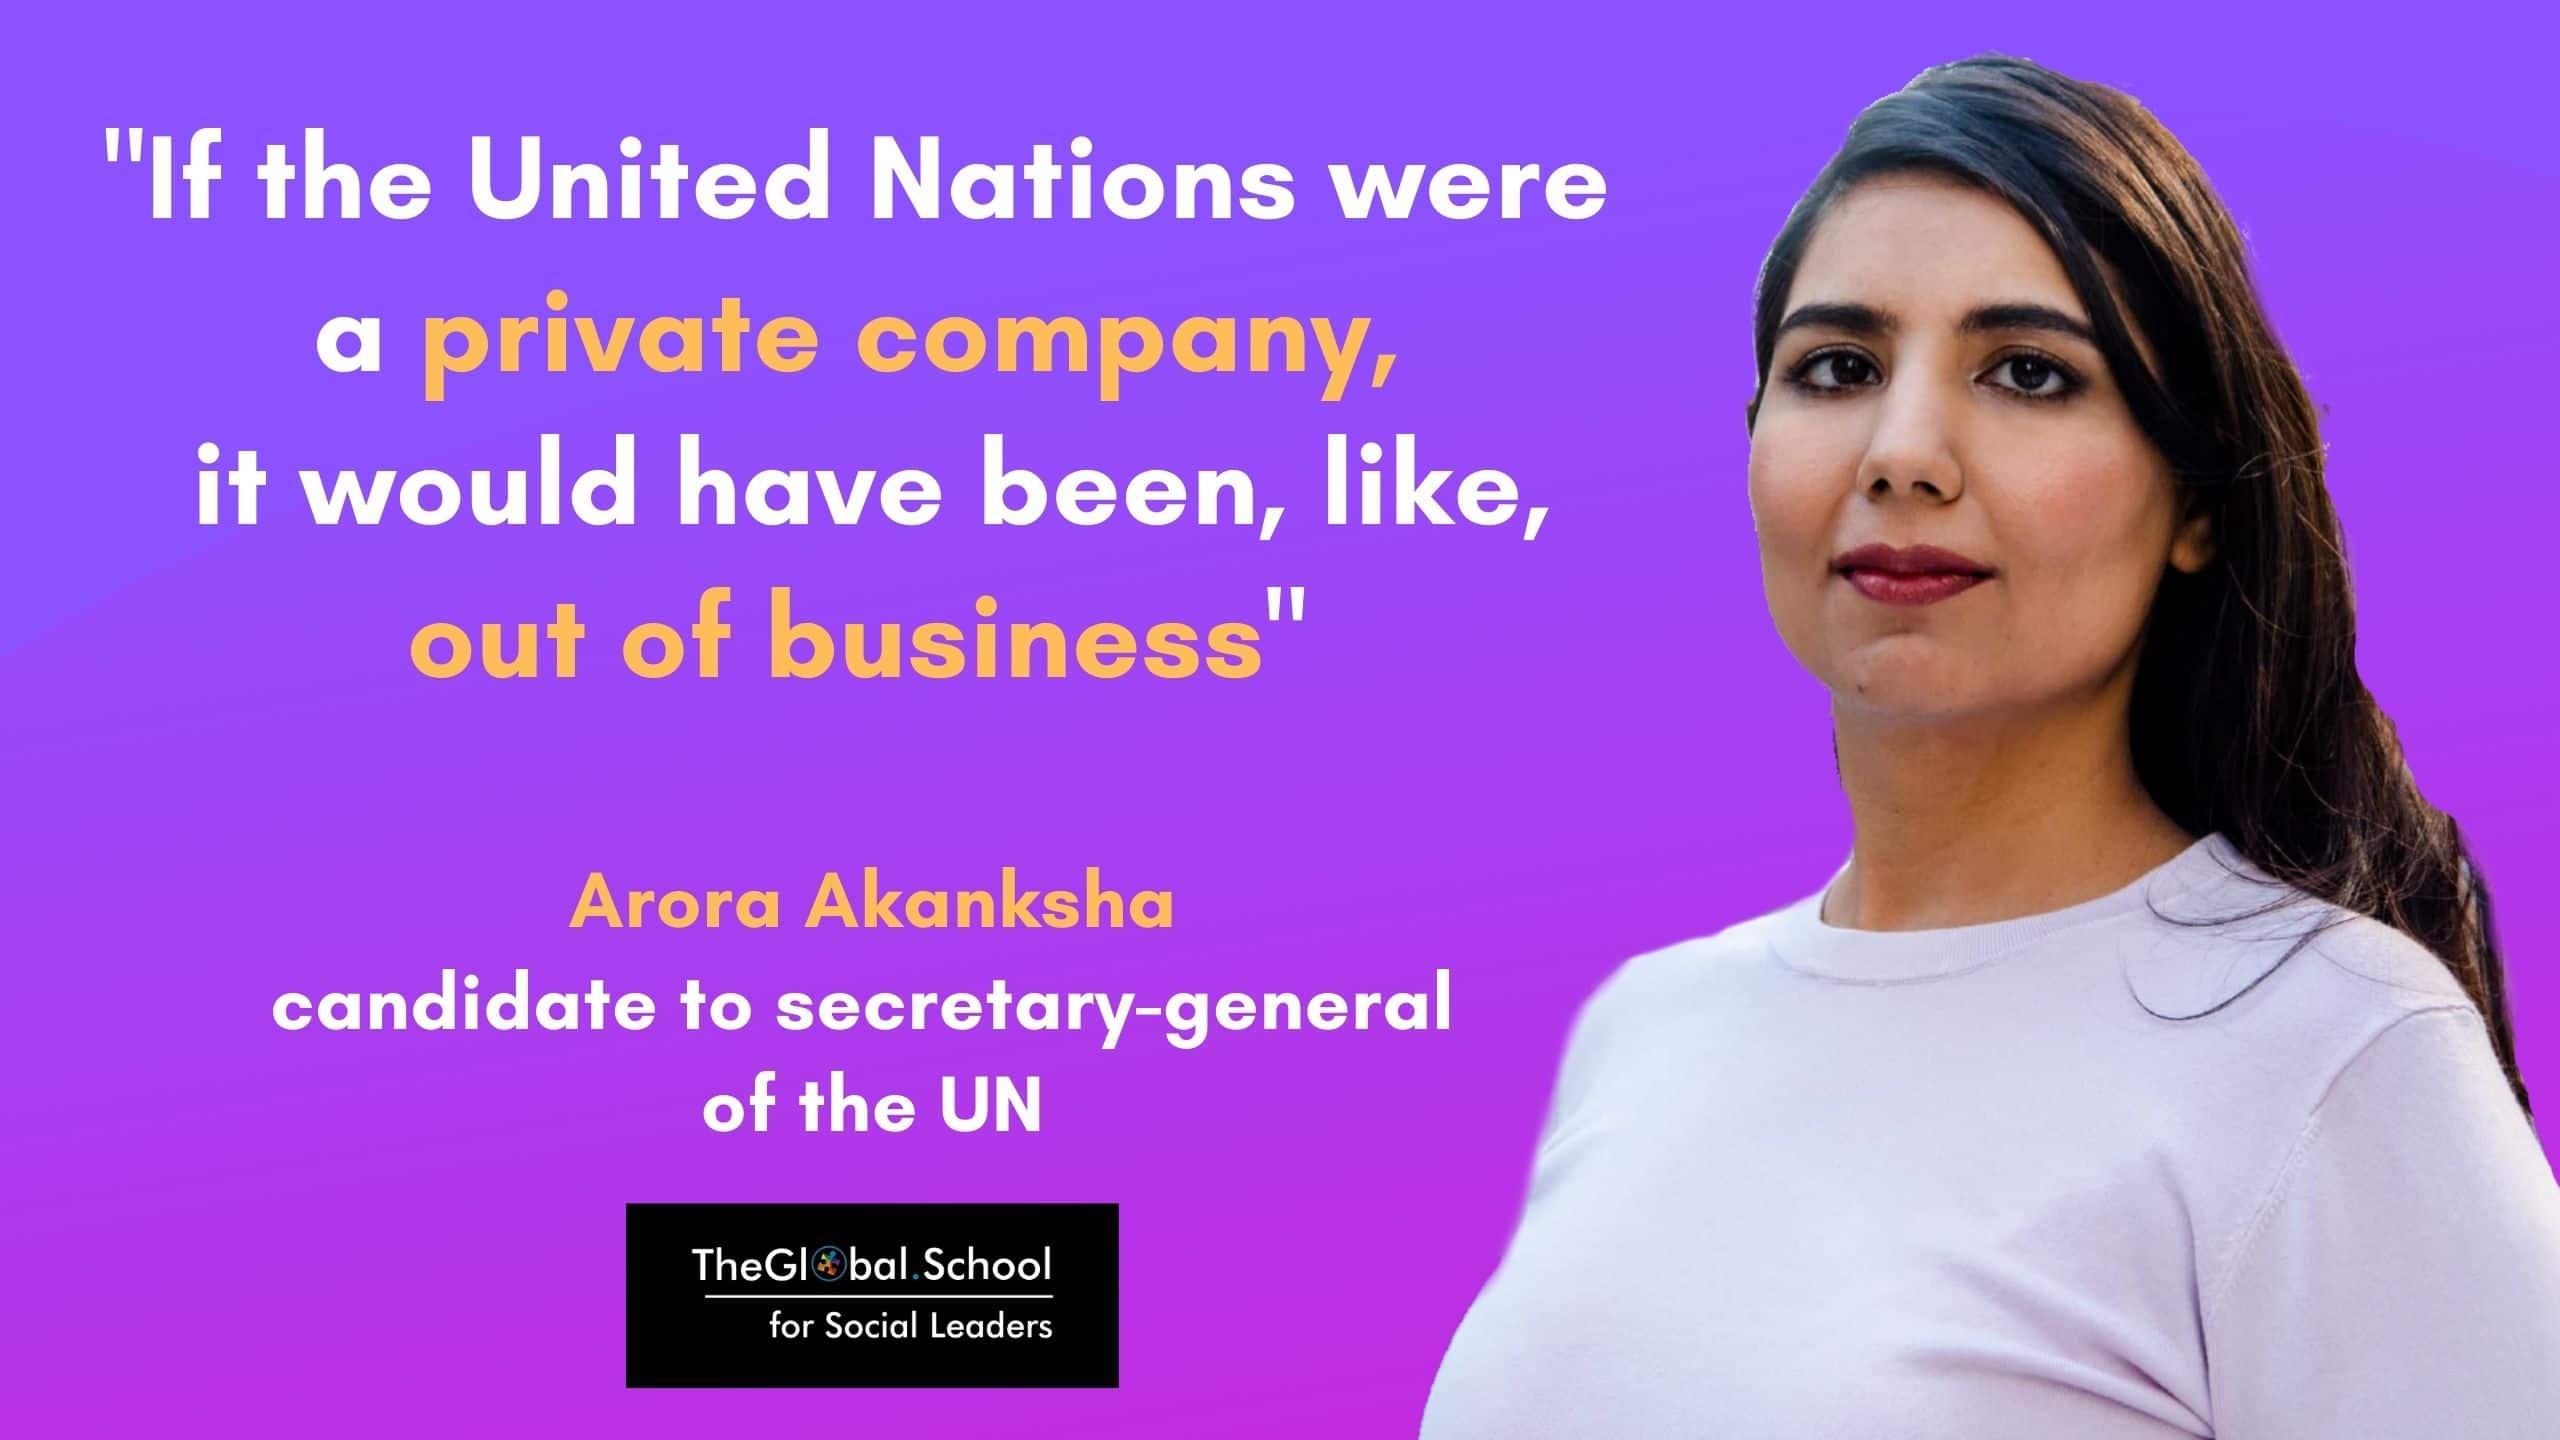 Who is Arora Akanksha?